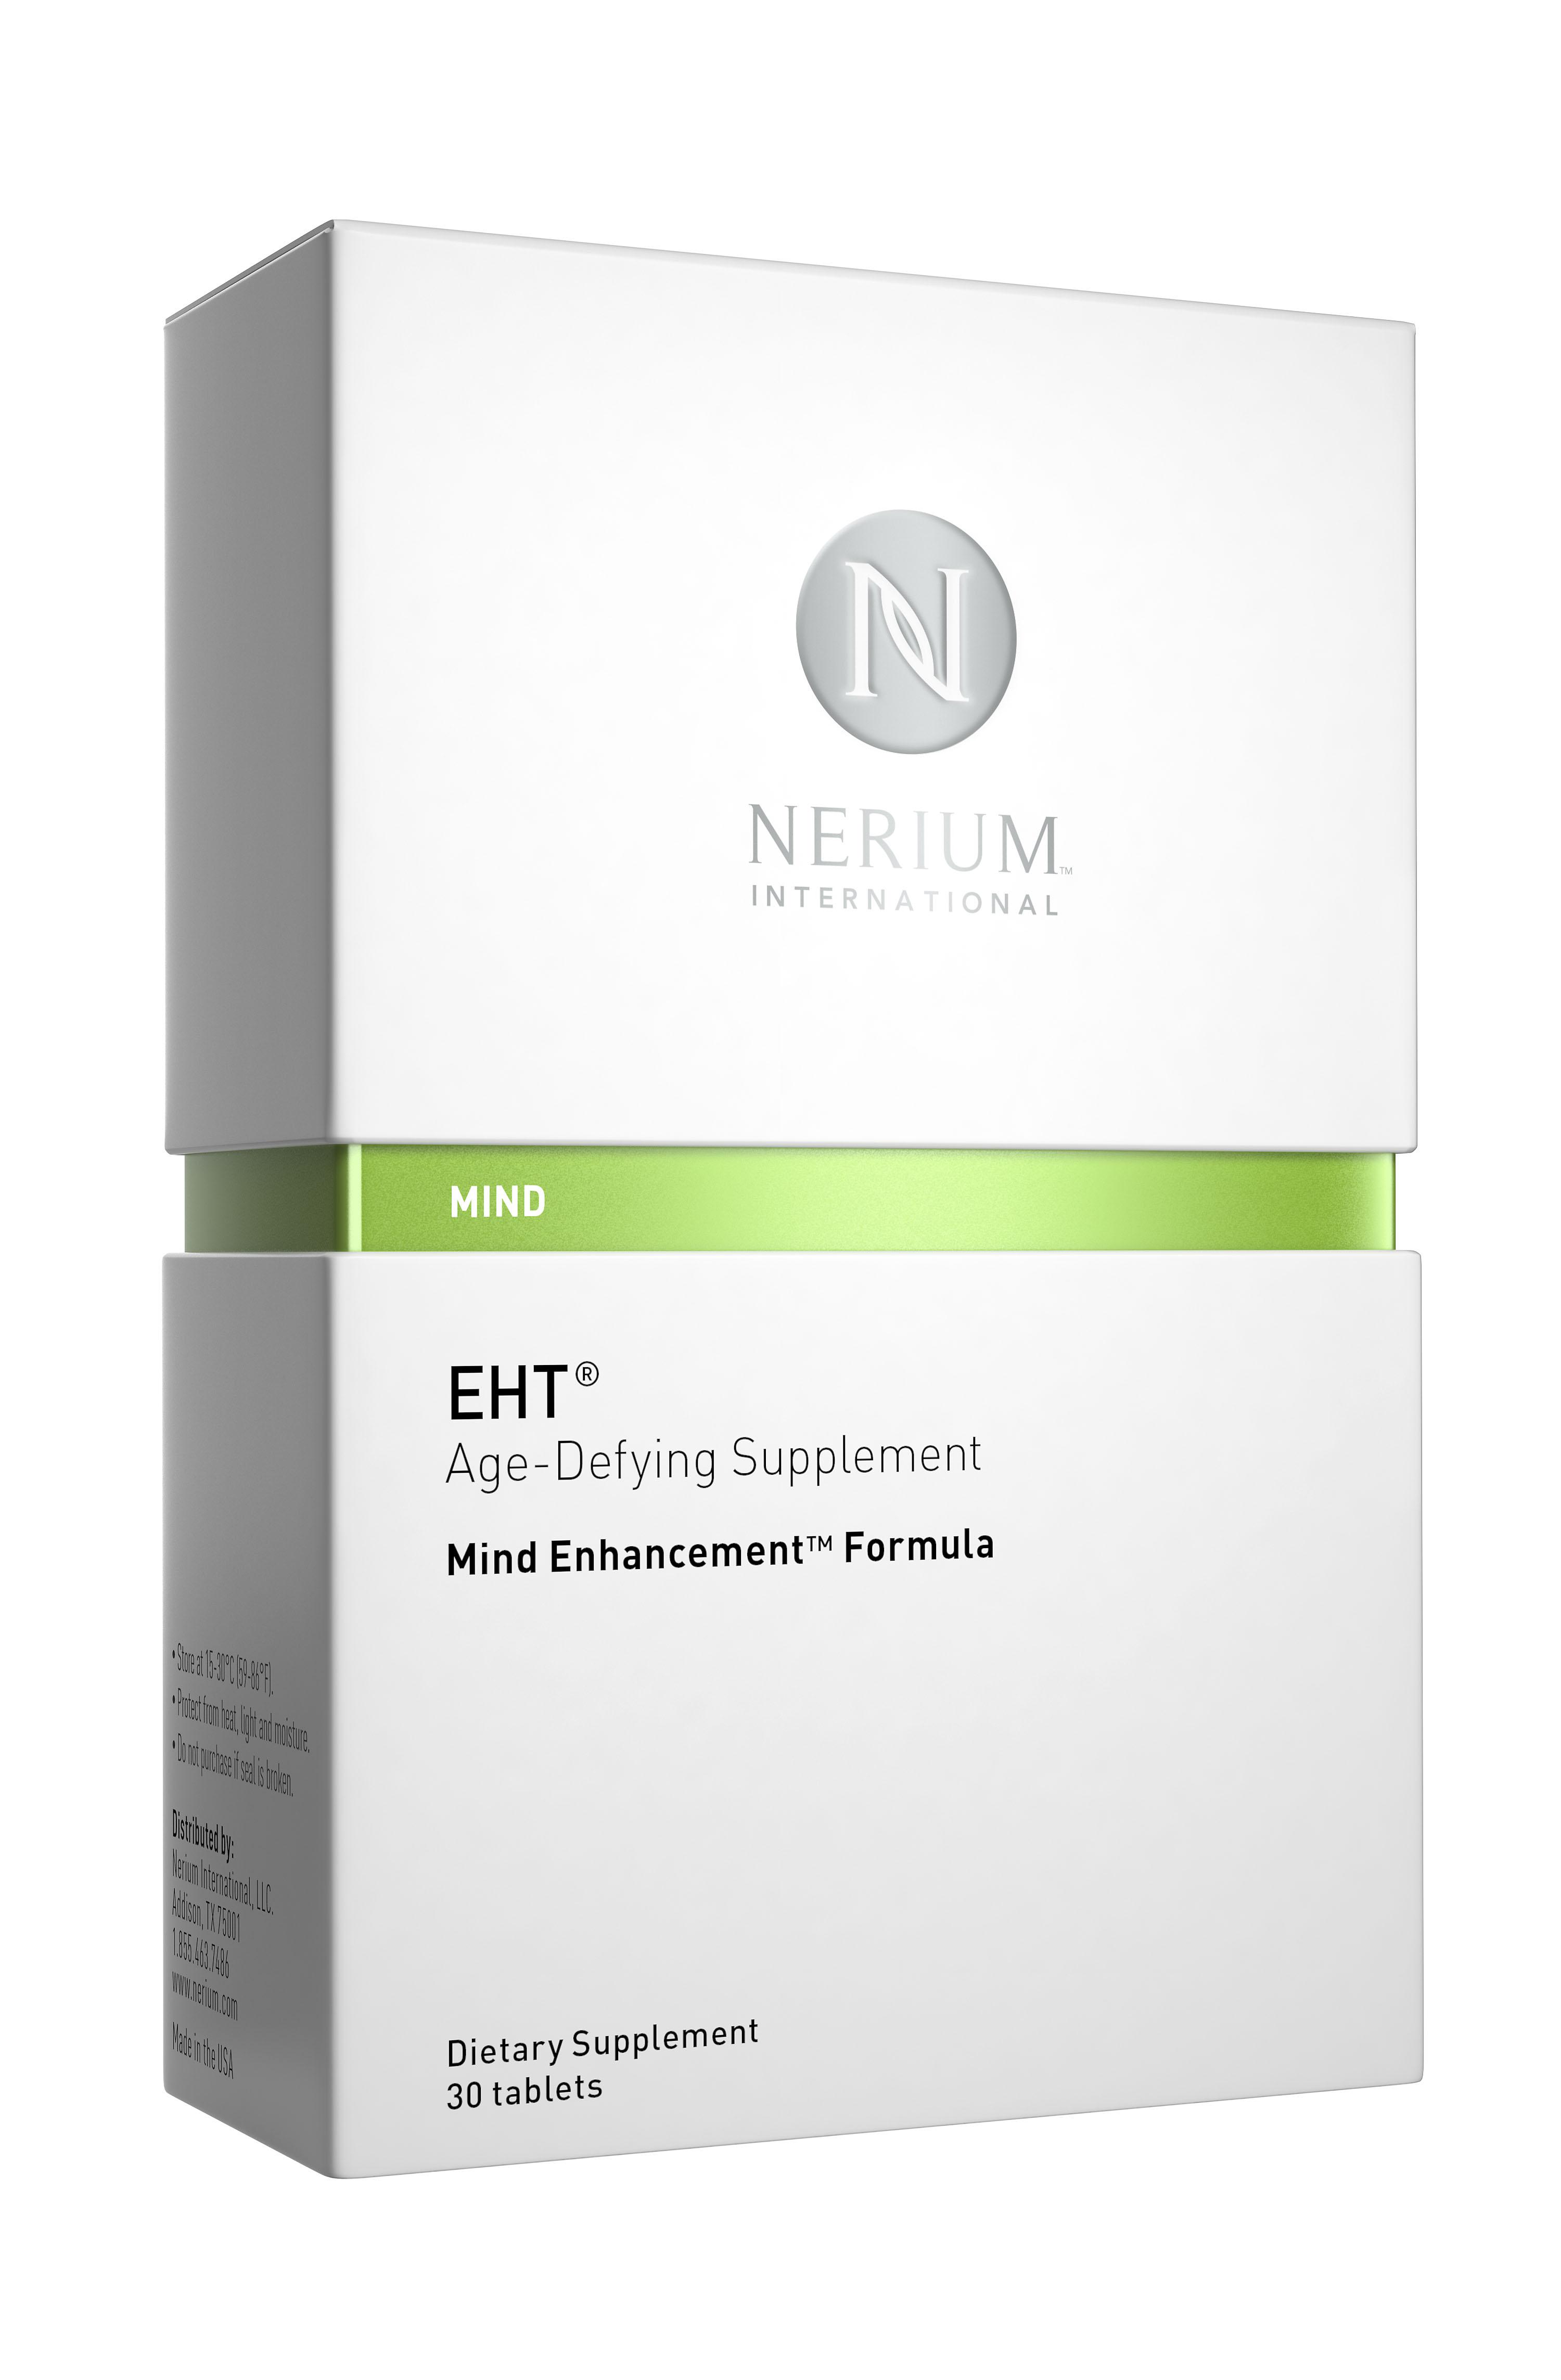 Nerium International Introduces New, Advanced Anti-Aging ...